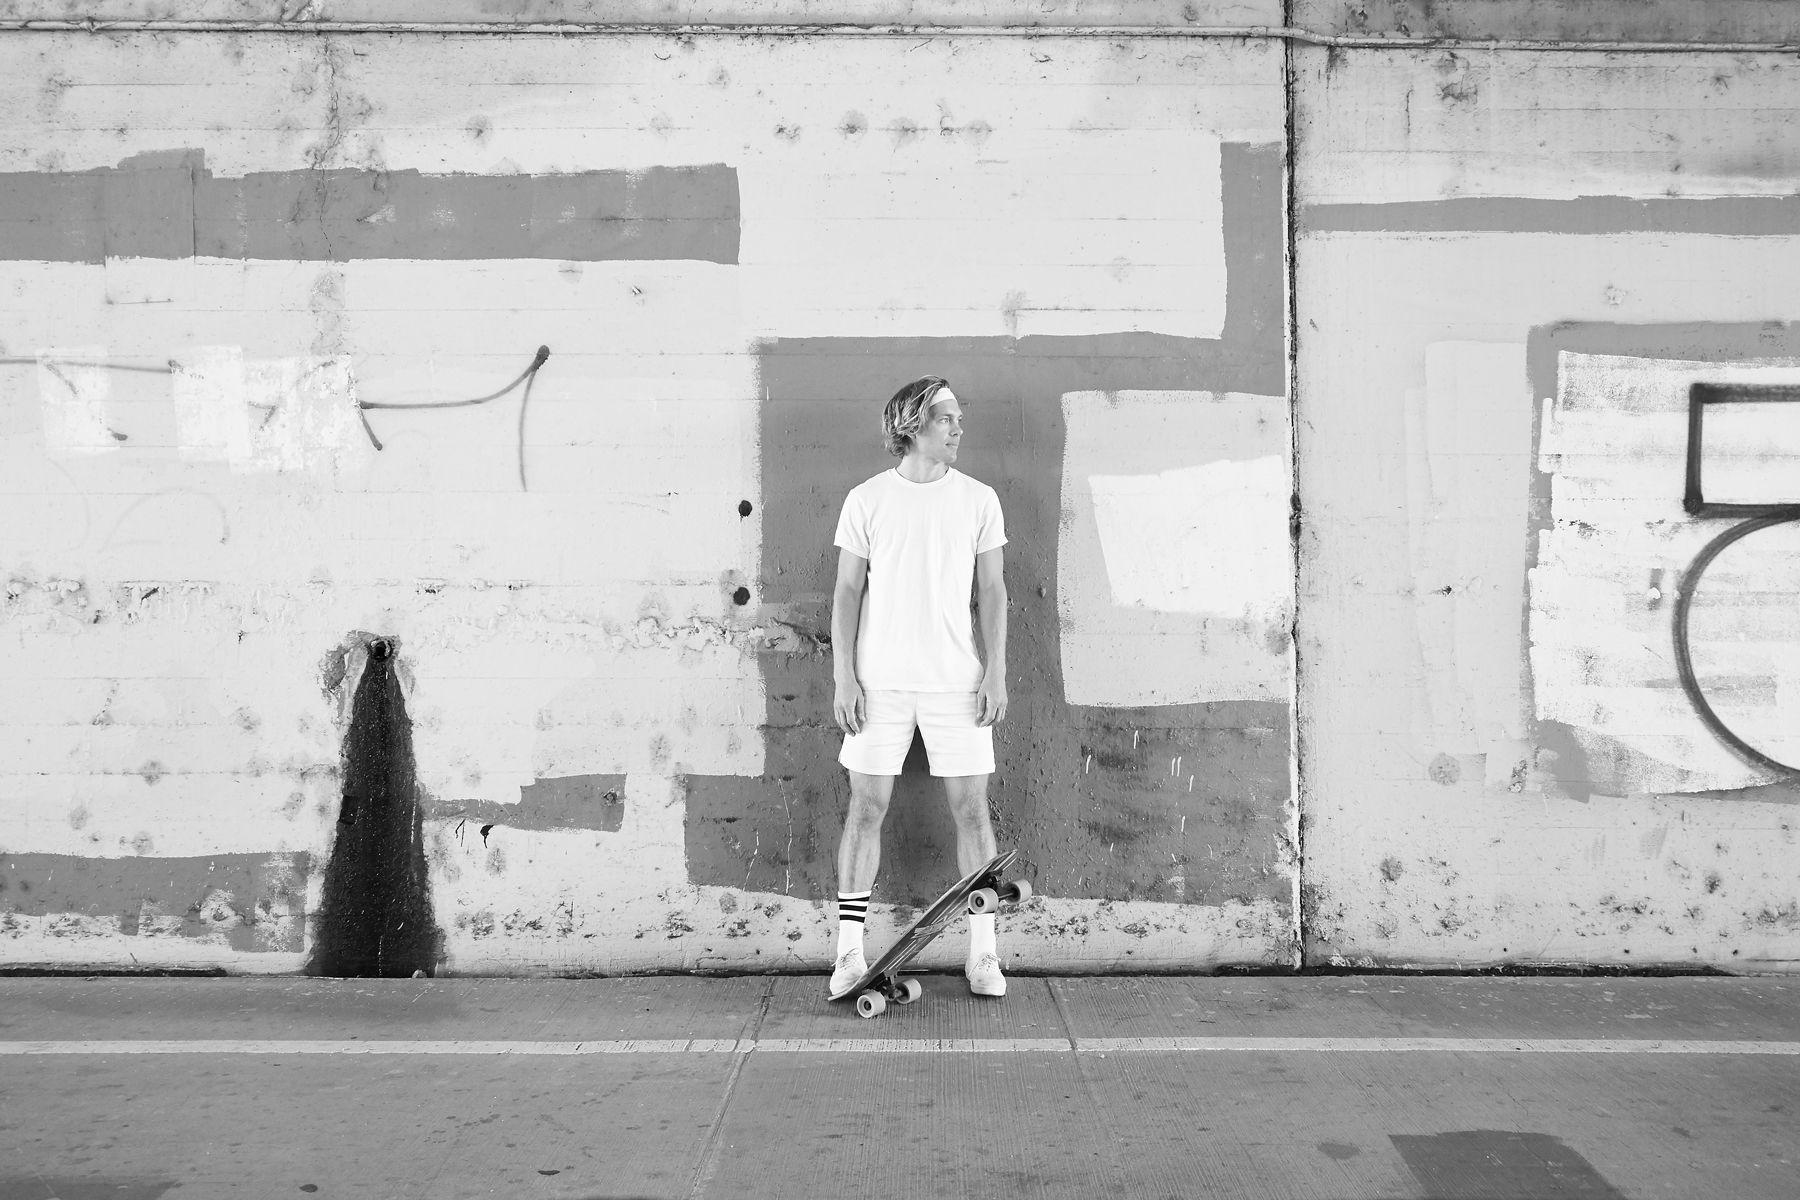 1r20151211_skateboarding_tomryen_0073_1.jpg